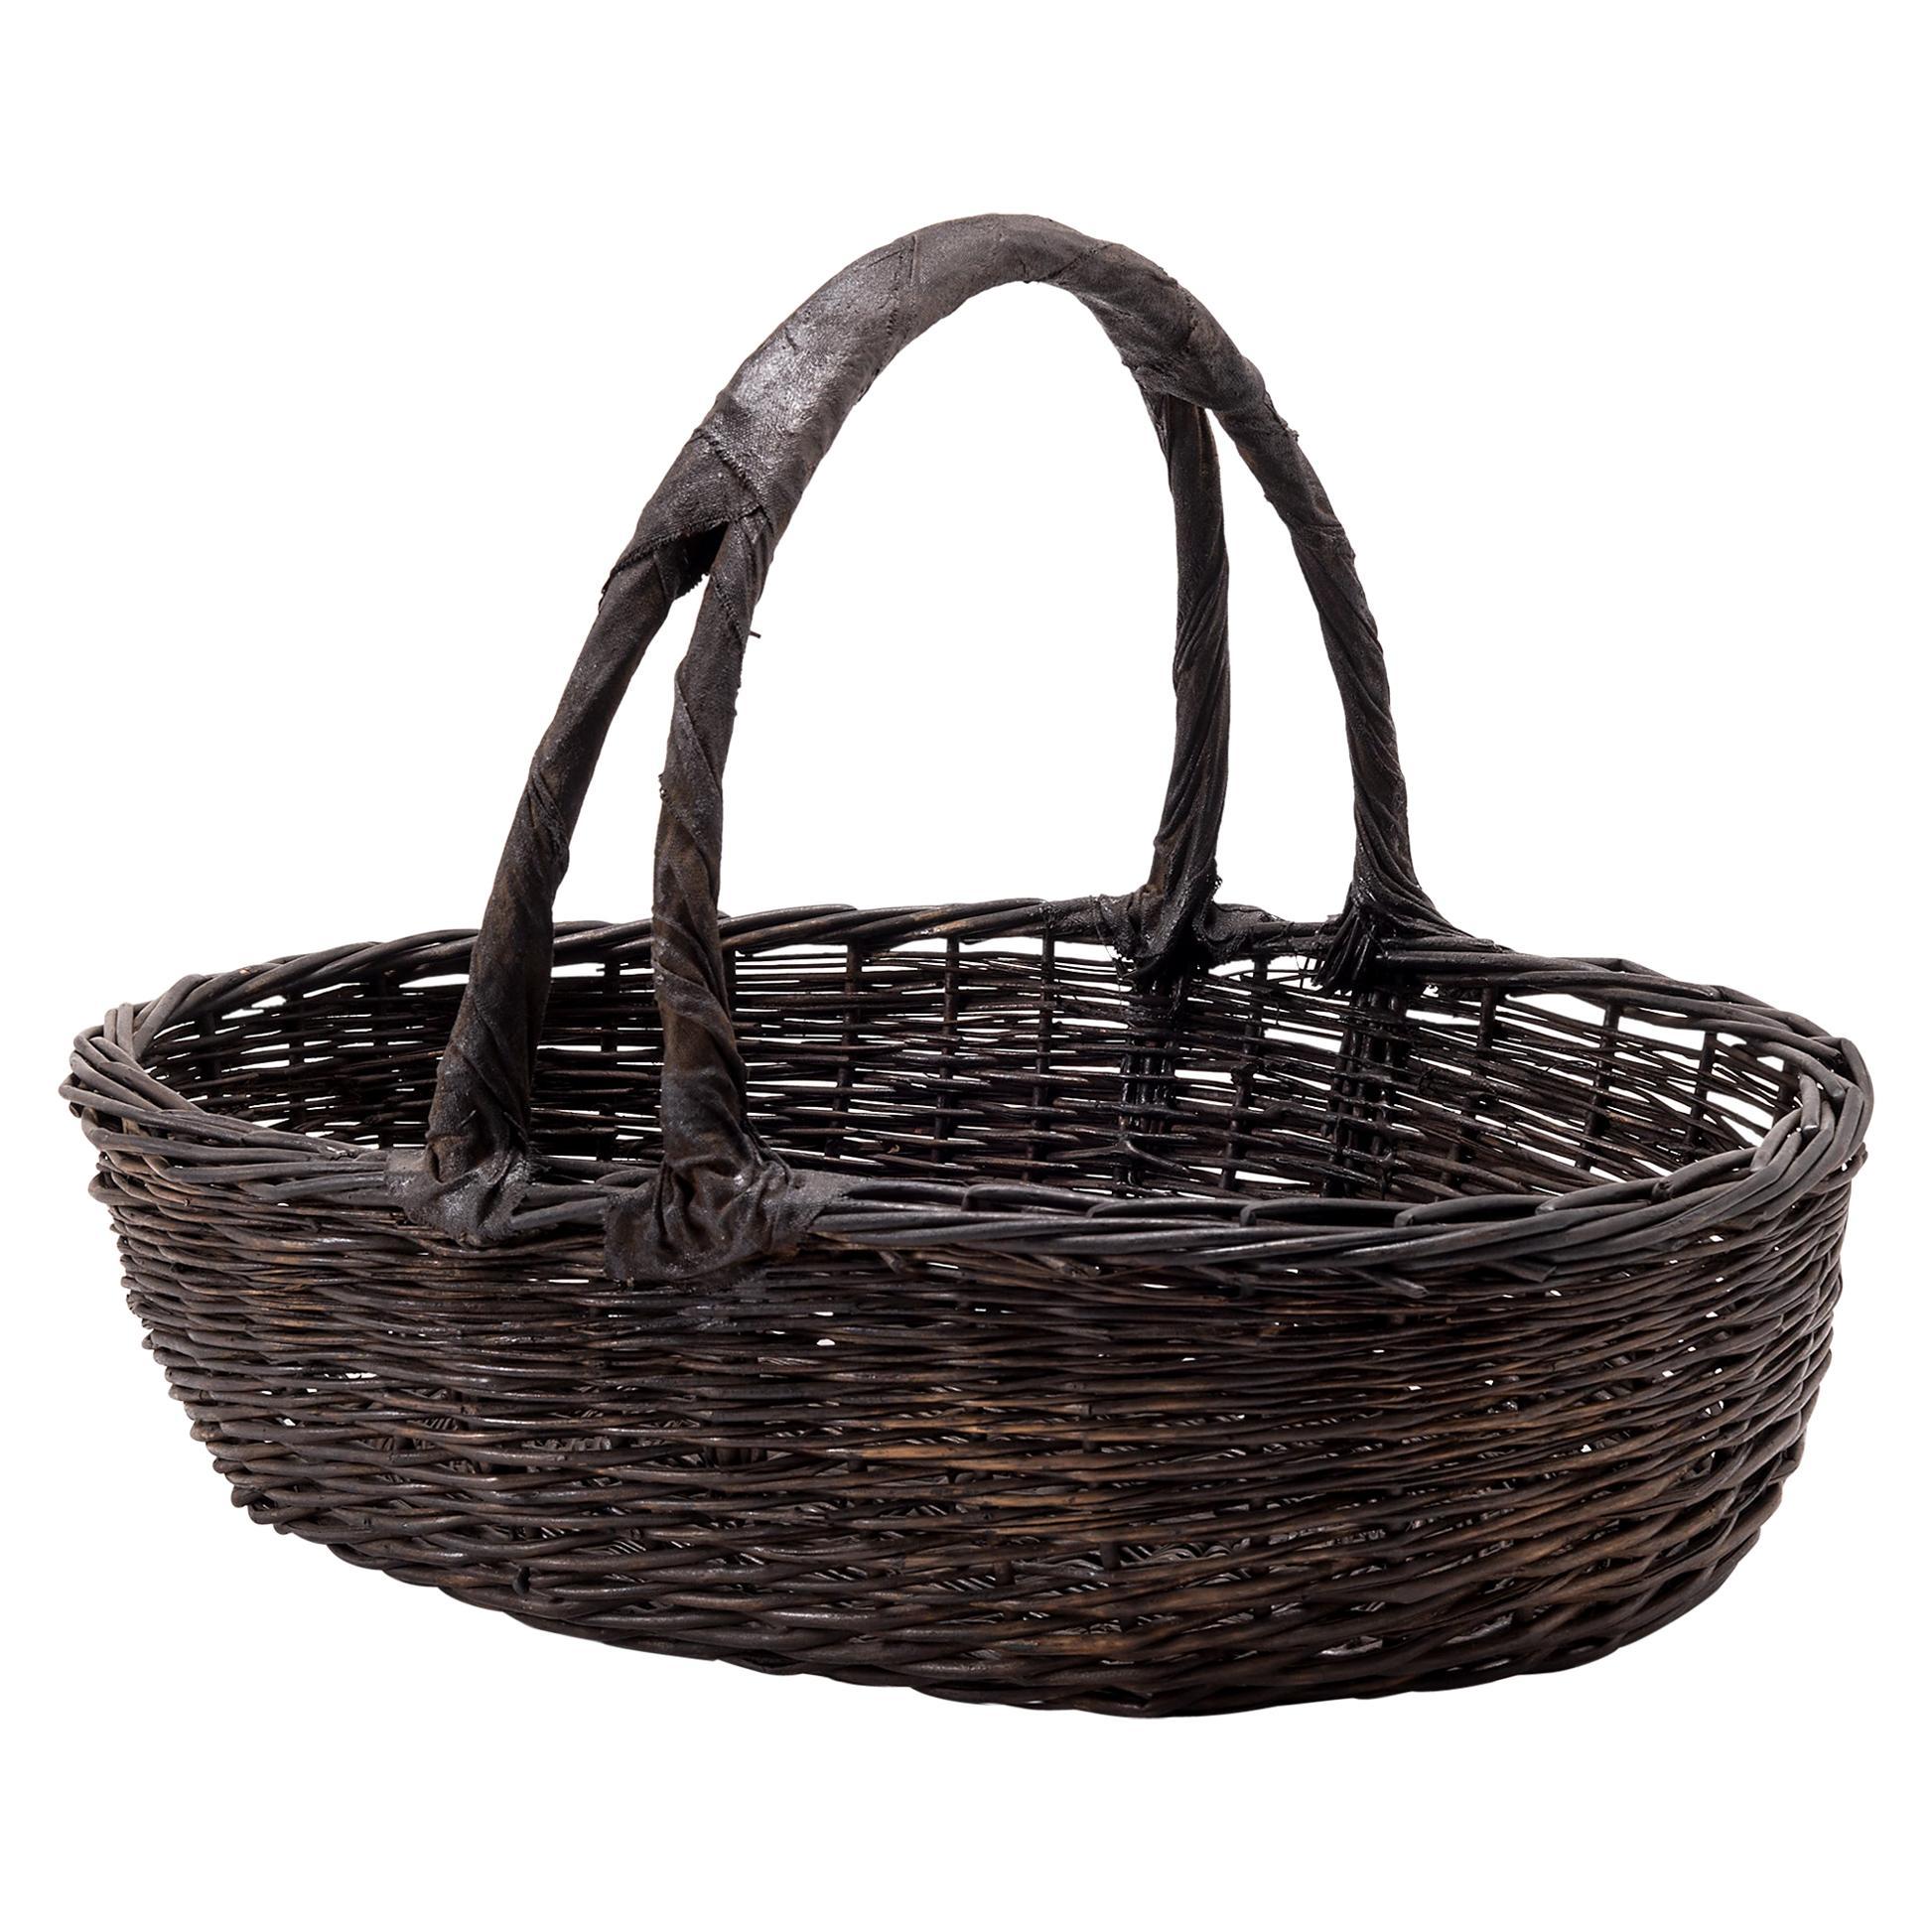 Vintage Chinese Woven Vegetable Basket